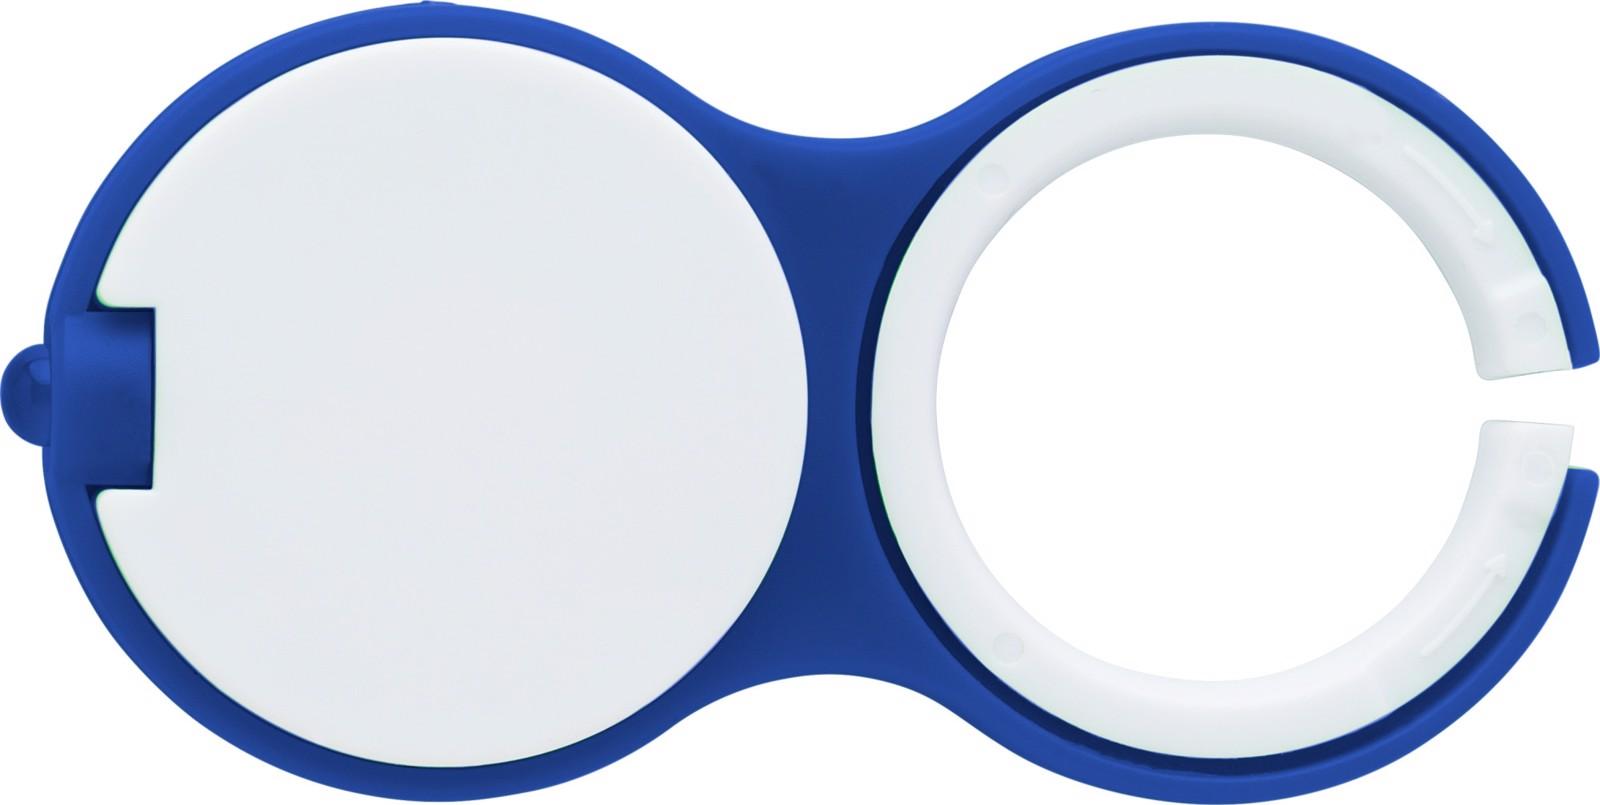 Plastic key holder with one LED light. - Blue